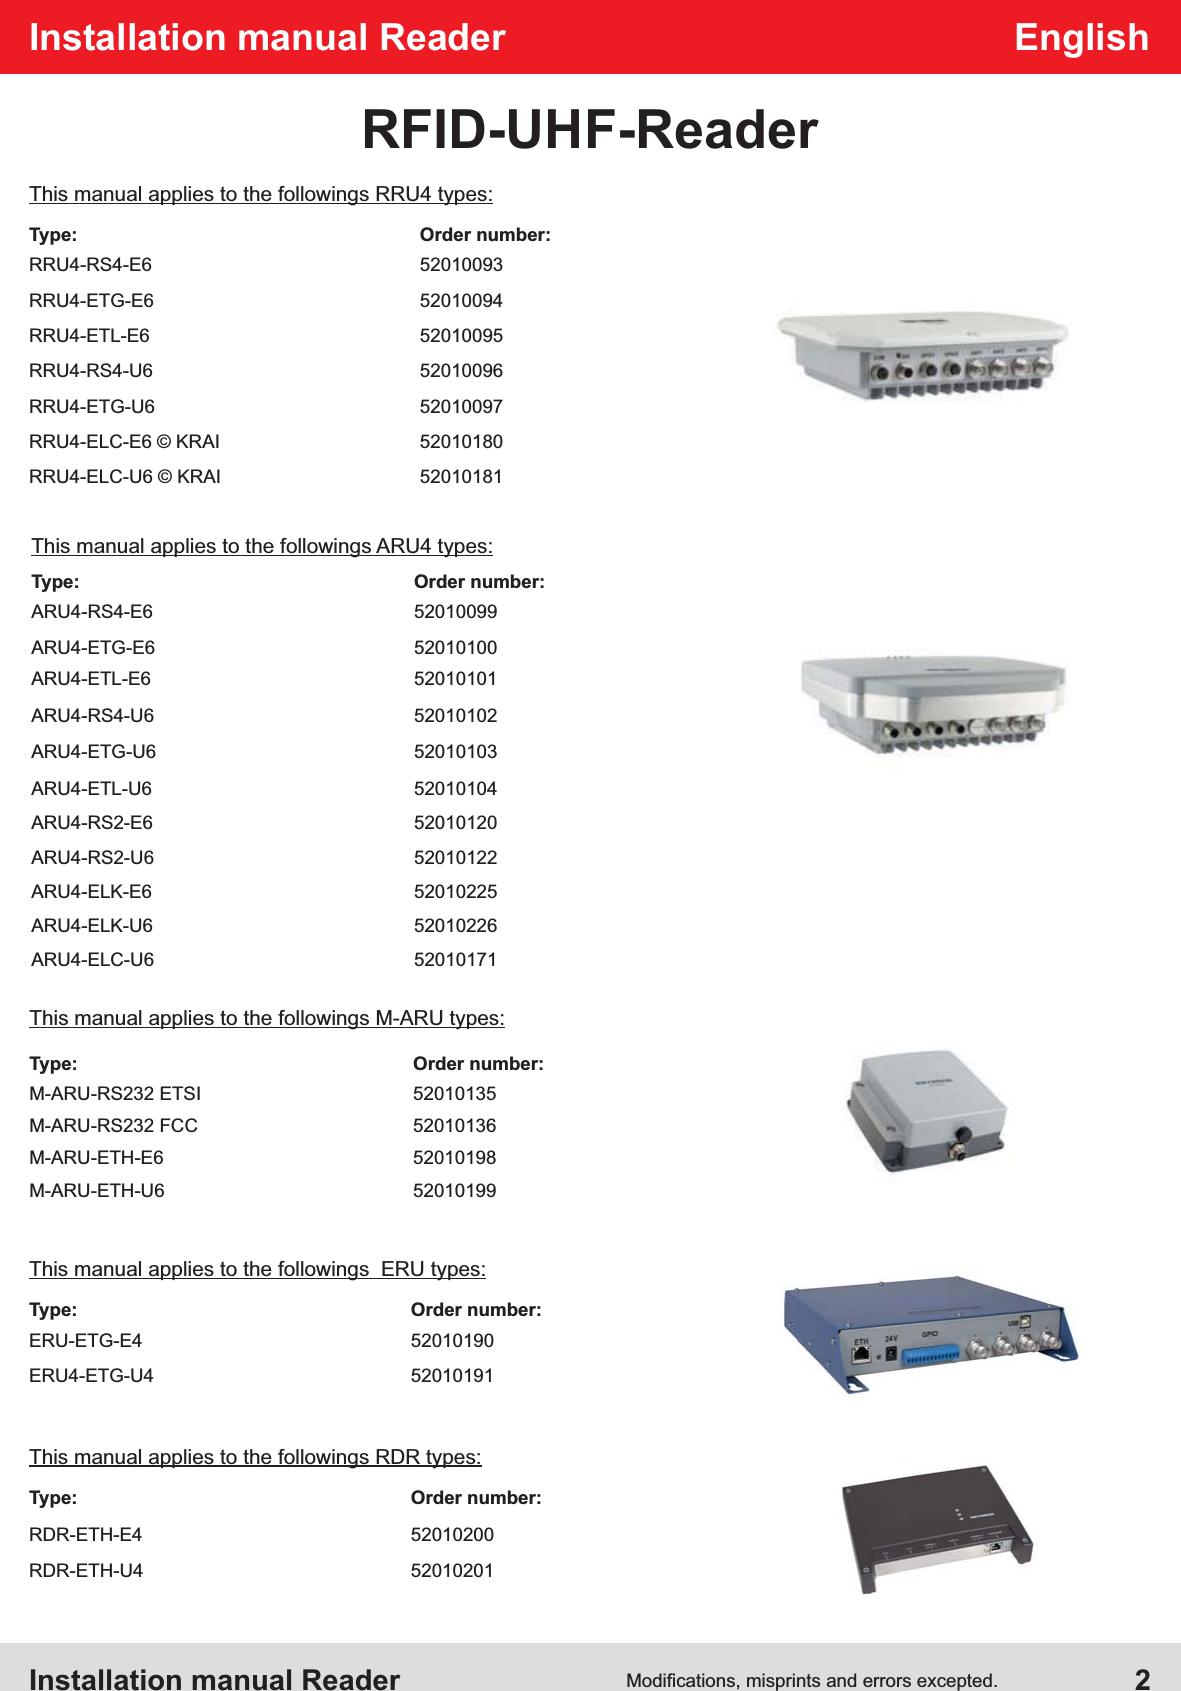 Installation manual Reader  2EnglishInstallation manual ReaderThis manual applies to the followings ARU4 types:Type: Order number:ARU4-RS4-E6 52010099ARU4-ETG-E6 52010100ARU4-ETL-E6 52010101ARU4-RS4-U6 52010102ARU4-ETG-U6 52010103ARU4-ETL-U6 52010104ARU4-RS2-E6 52010120ARU4-RS2-U6 52010122ARU4-ELK-E6 52010225ARU4-ELK-U6 52010226ARU4-ELC-U6 52010171This manual applies to the followings M-ARU types:Type: Order number:M-ARU-RS232 ETSI 52010135M-ARU-RS232 FCC 52010136M-ARU-ETH-E6 52010198M-ARU-ETH-U6 52010199RFID-UHF-ReaderThis manual applies to the followings RRU4 types:Type: Order number:RRU4-RS4-E6 52010093RRU4-ETG-E6 52010094RRU4-ETL-E6 52010095RRU4-RS4-U6 52010096RRU4-ETG-U6 52010097RRU4-ELC-E6 © KRAI 52010180RRU4-ELC-U6 © KRAI 52010181This manual applies to the followings  ERU types:Type: Order number:ERU-ETG-E4 52010190ERU4-ETG-U4 52010191This manual applies to the followings RDR types:Type: Order number:RDR-ETH-E4 52010200RDR-ETH-U4 52010201